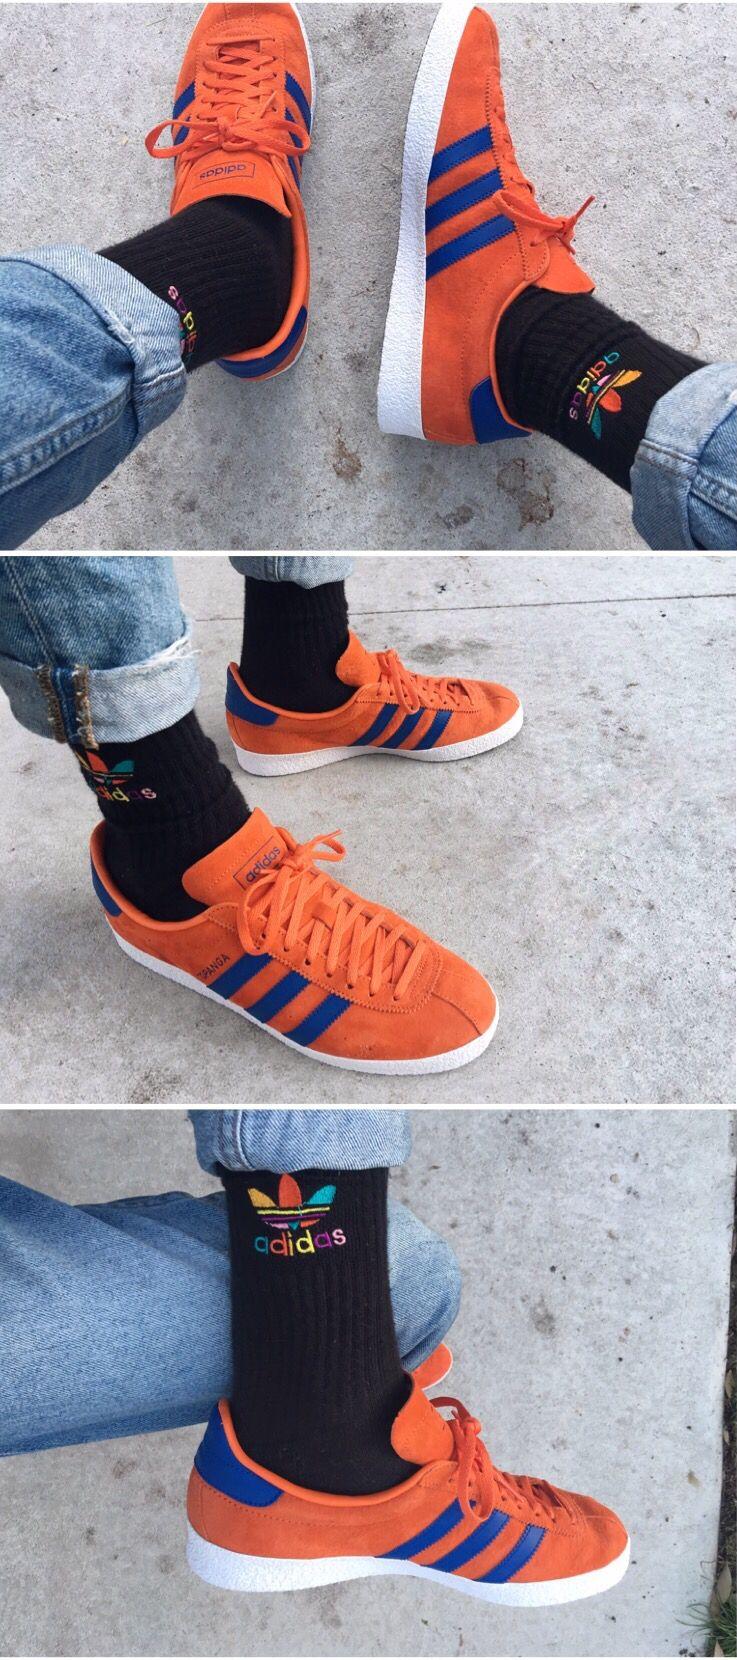 Adidas originals   Topanga   sneakers   jonofriend   ASOS